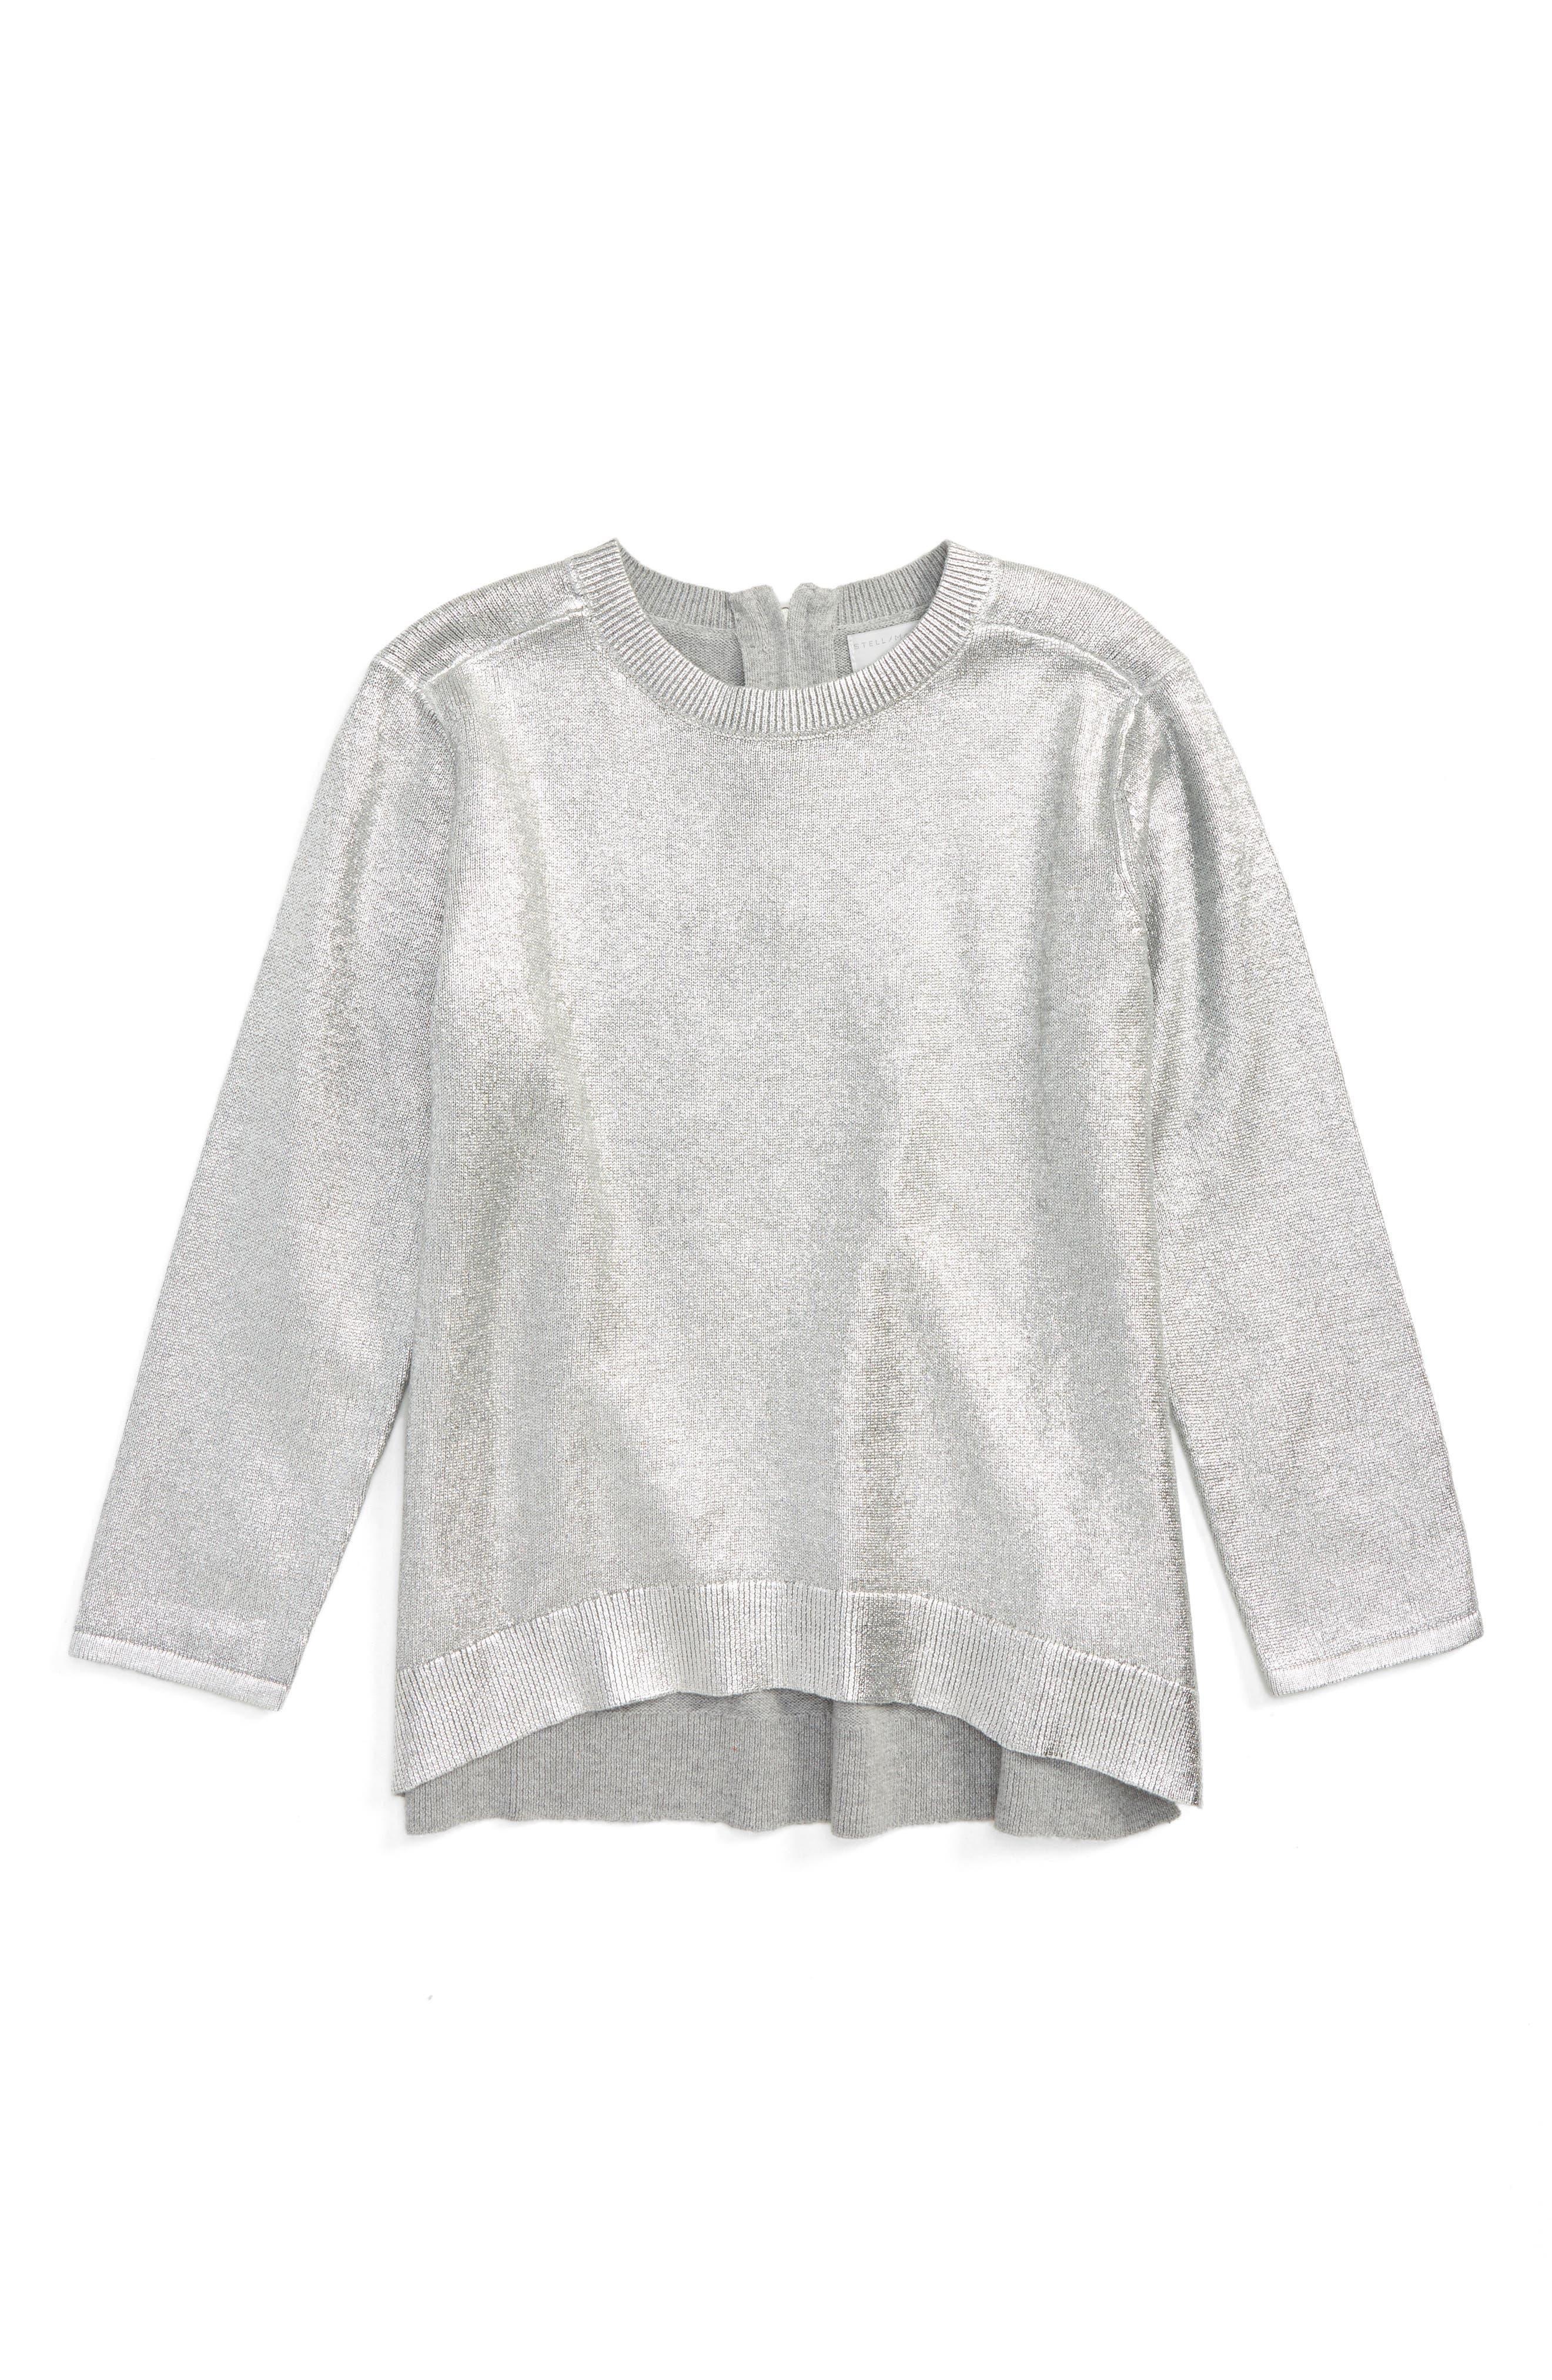 Stella McCartney Kids Jewel Foil Sweater (Toddler Girls, Little Girls & Big Girls)